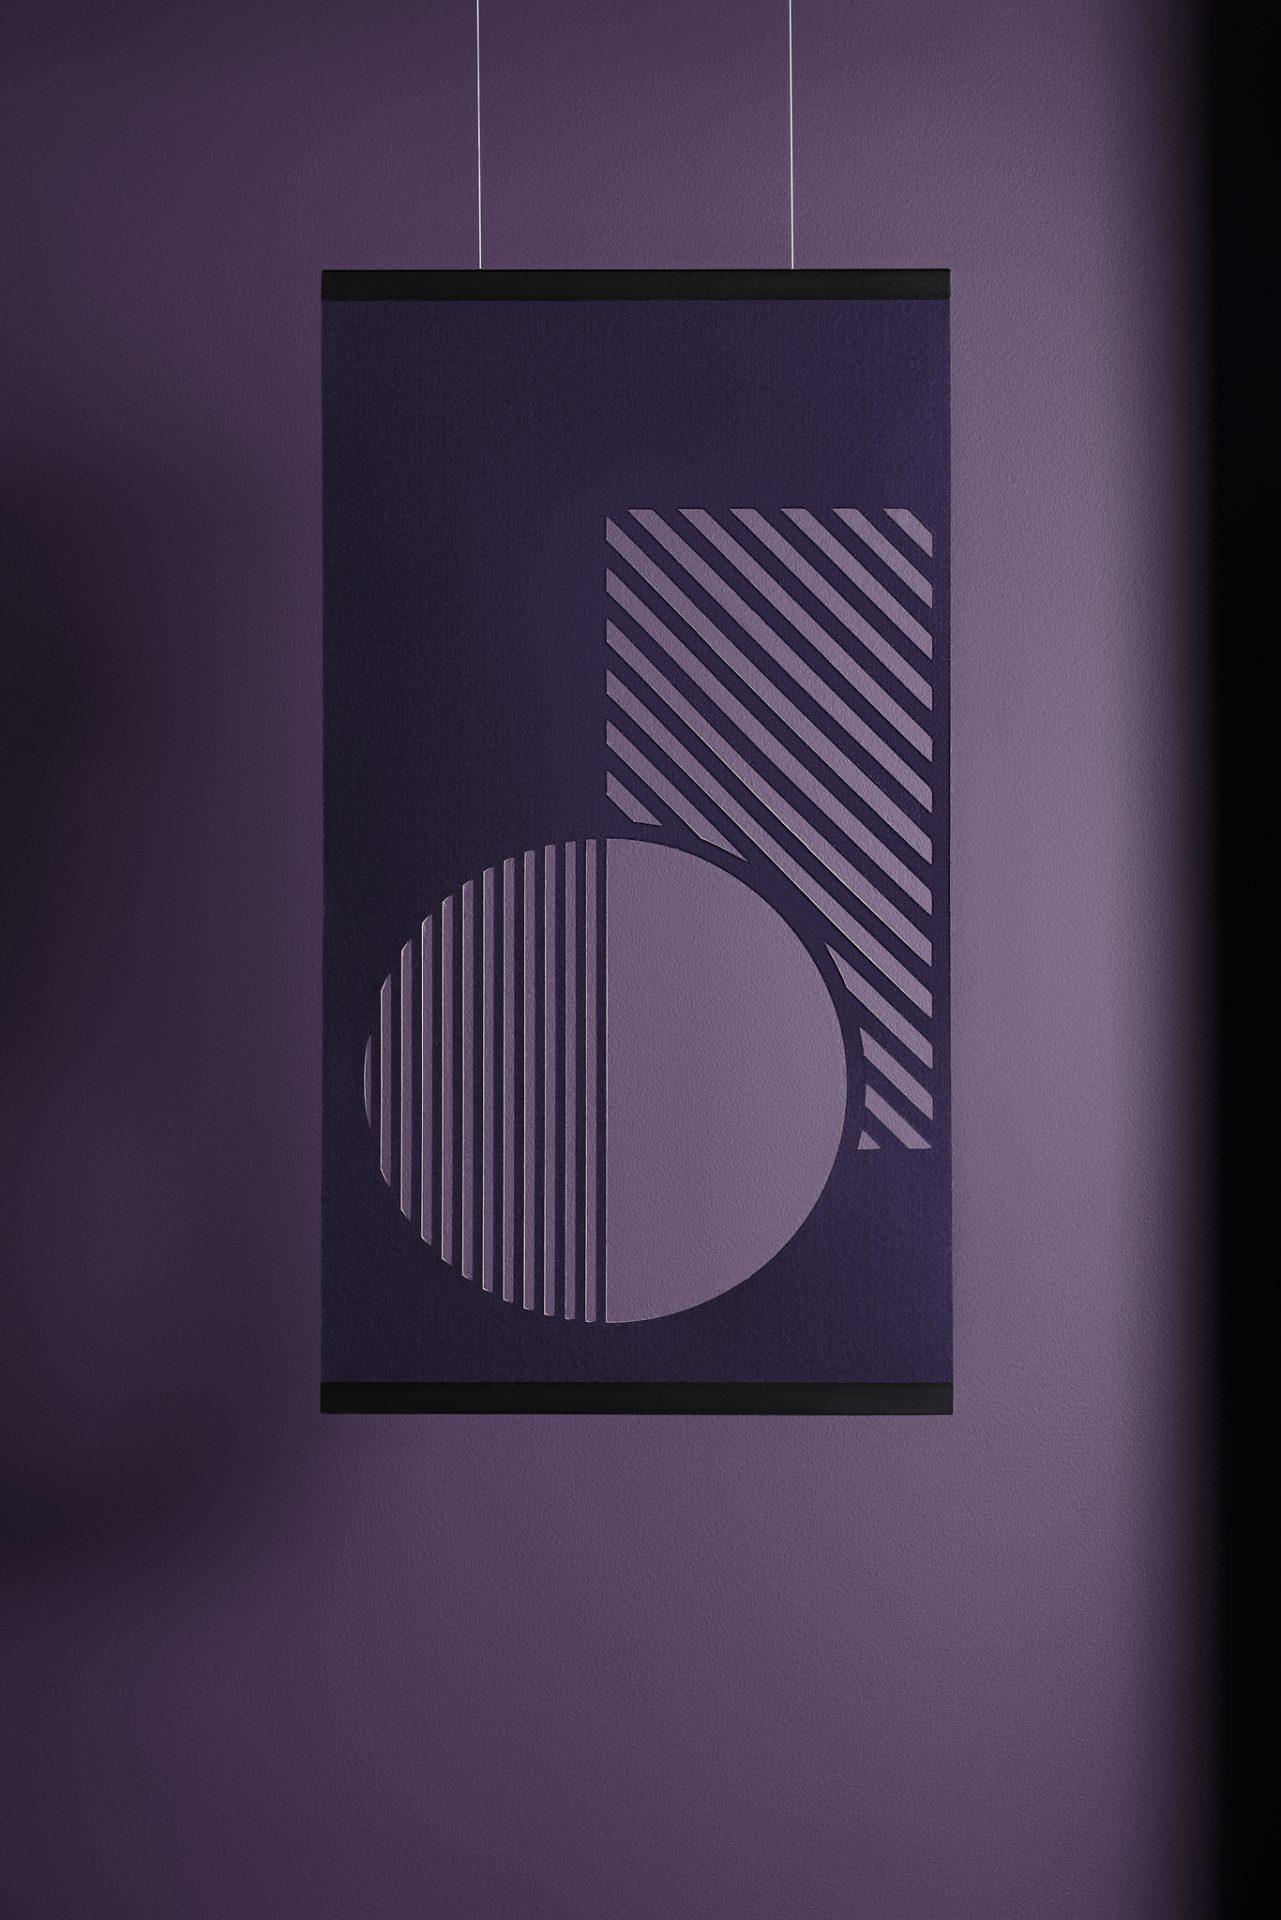 hyz_projektuje_designalive-17